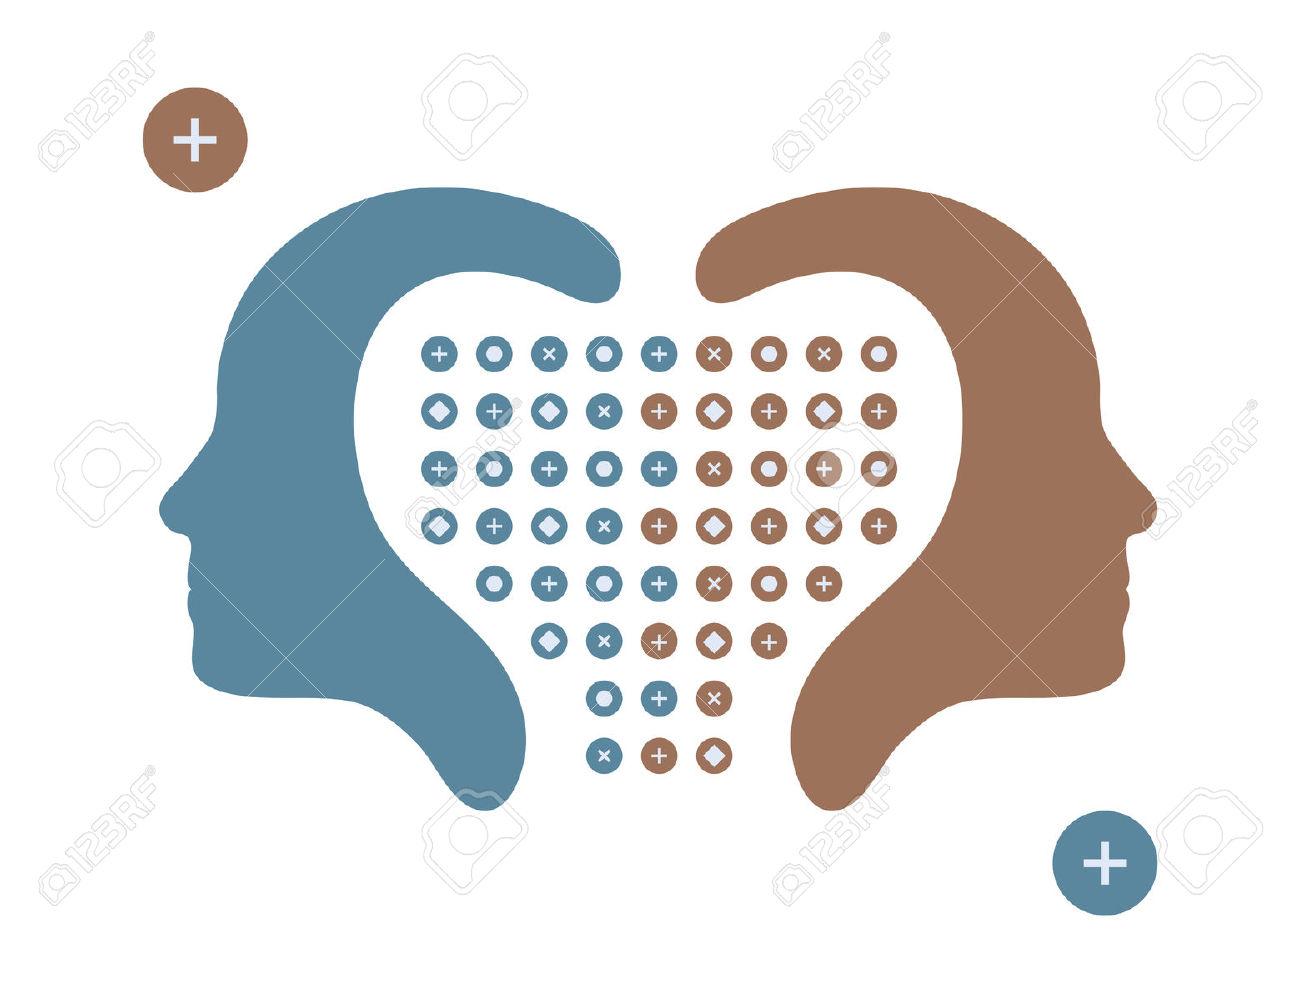 Vector Illustration Of Human Heads, Profiles Face Opposite Ways.